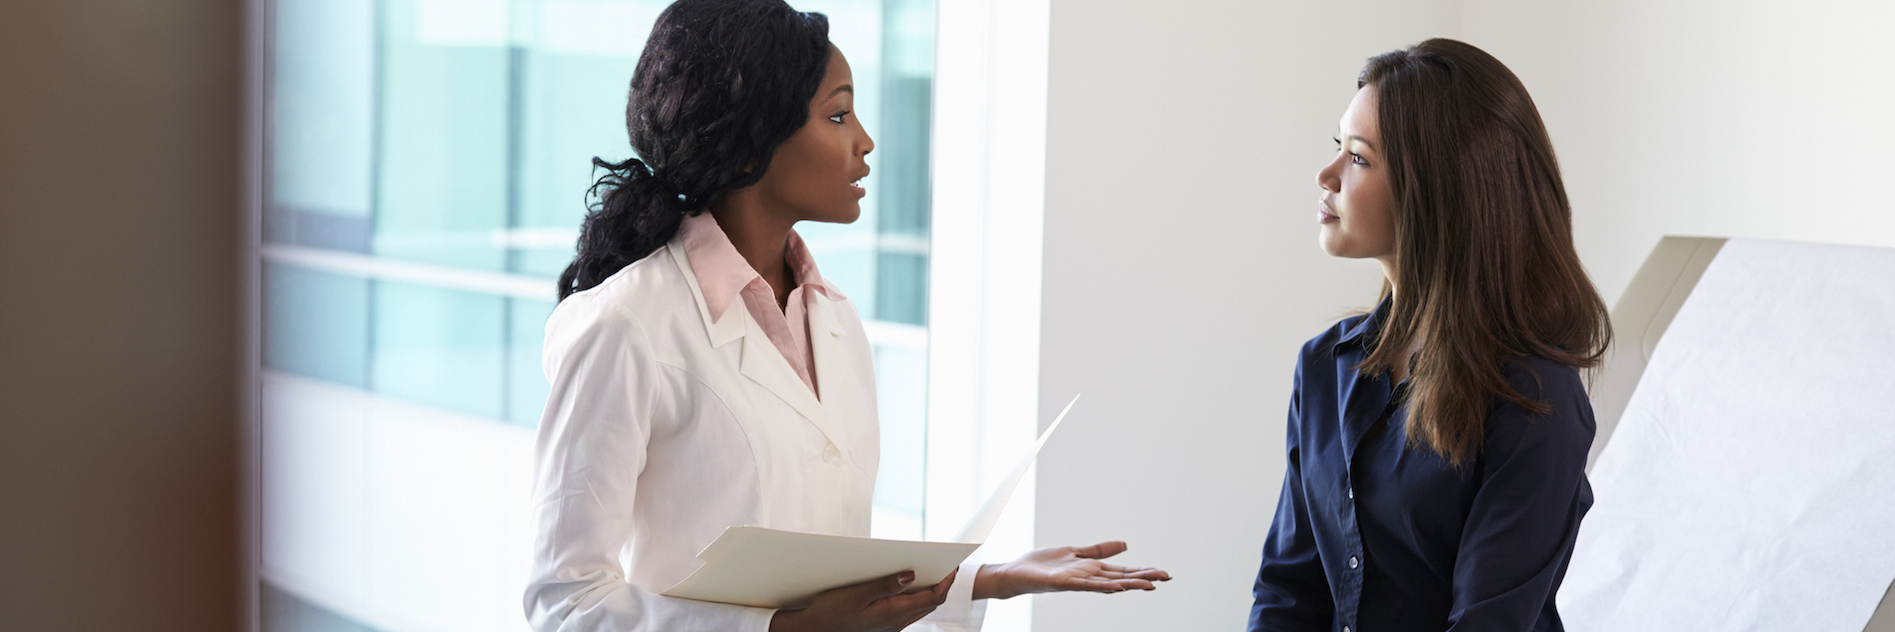 Doctor meeting with patient in exam room